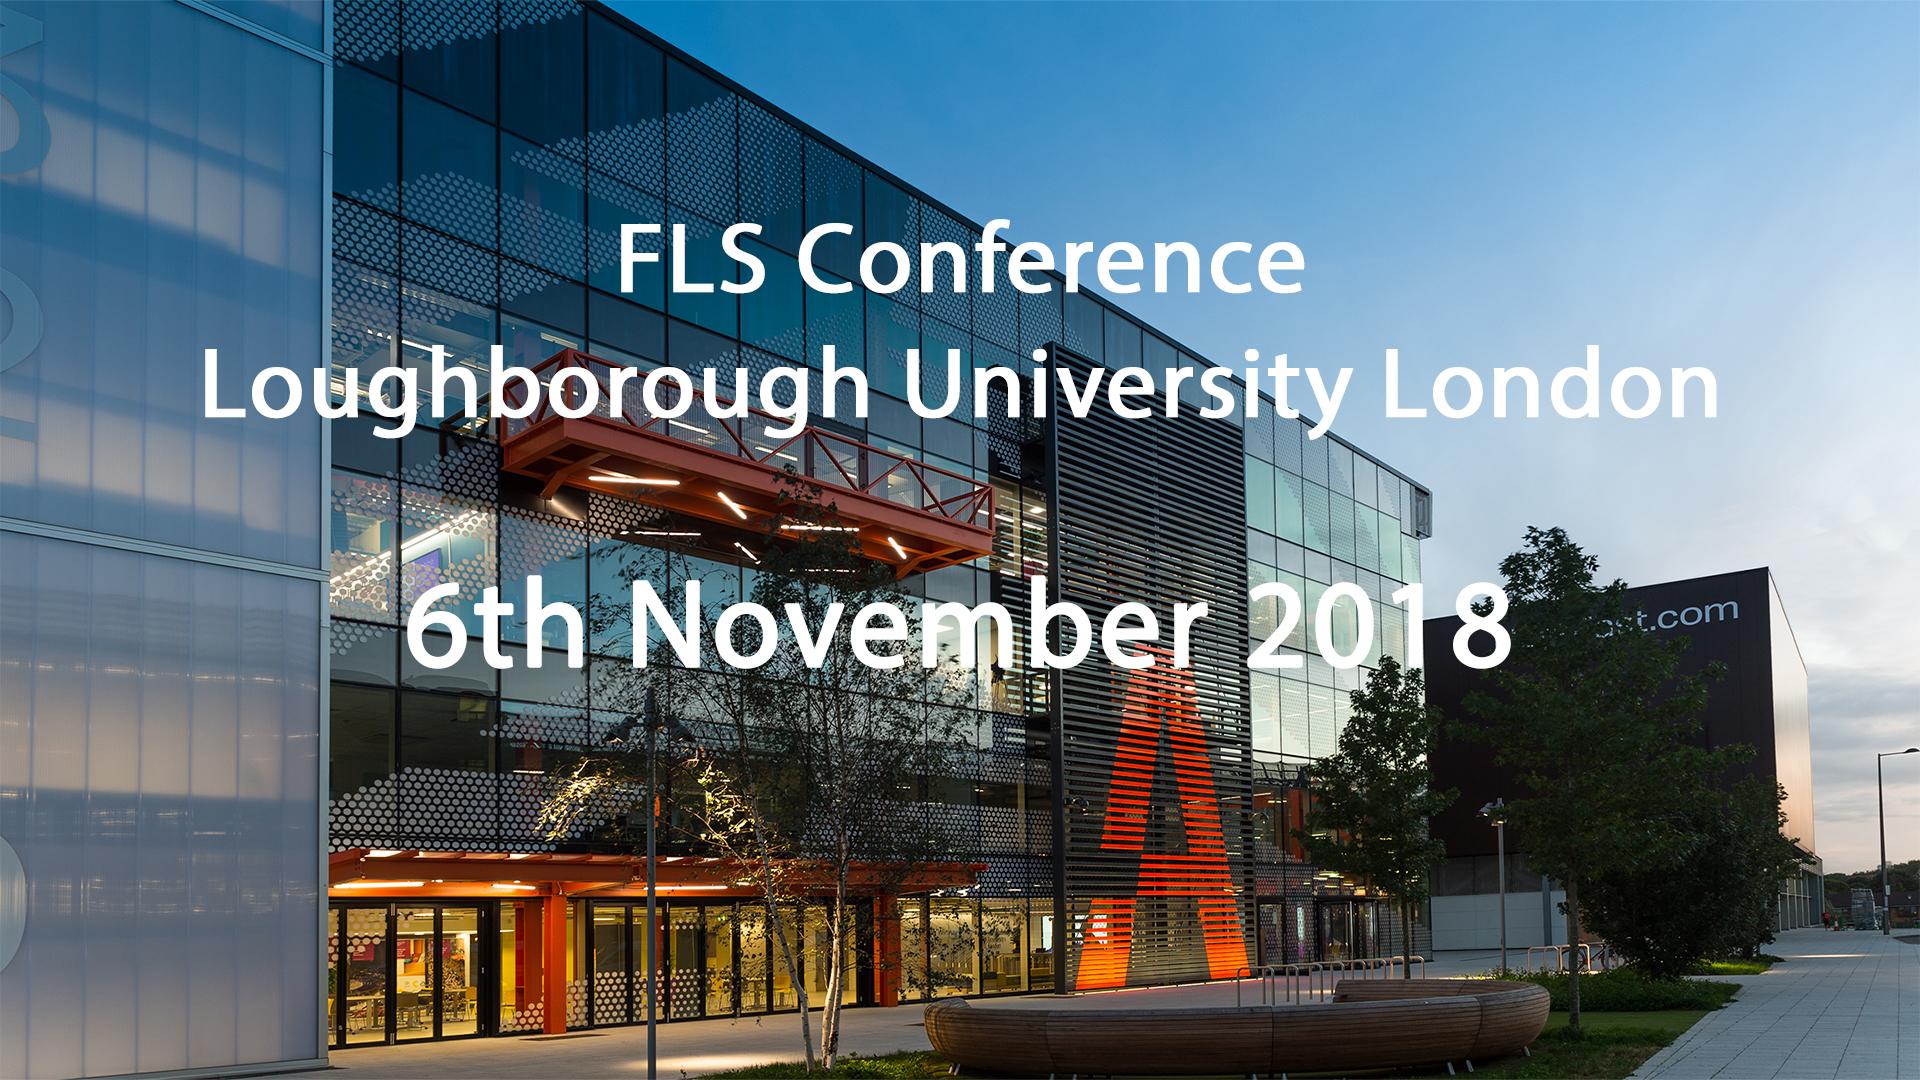 FLS_Loughborough University.jpg